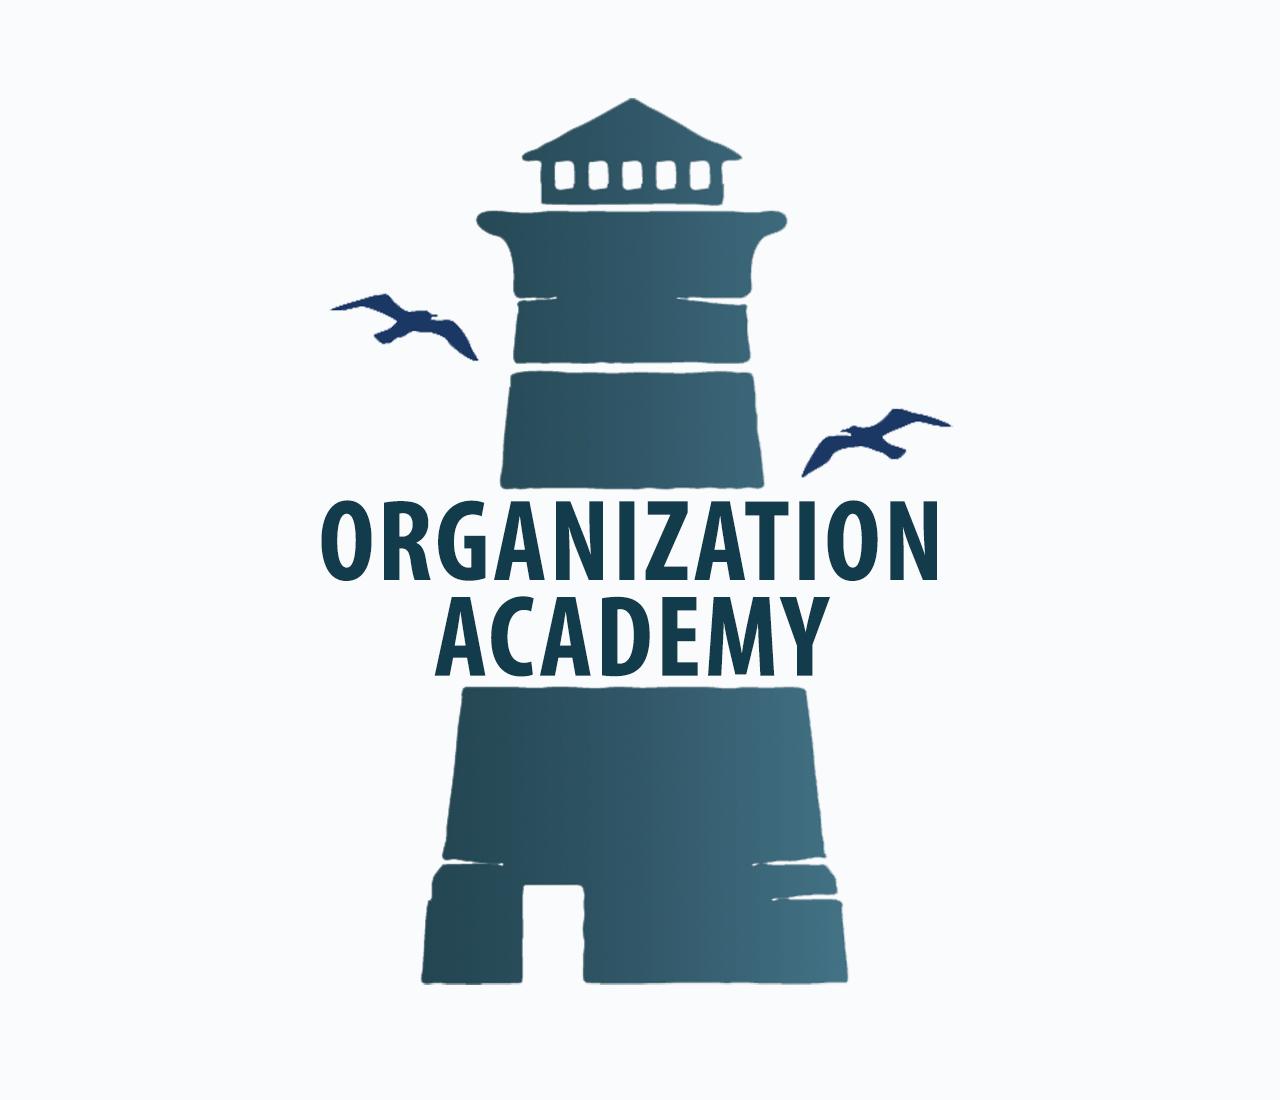 Organization Academy